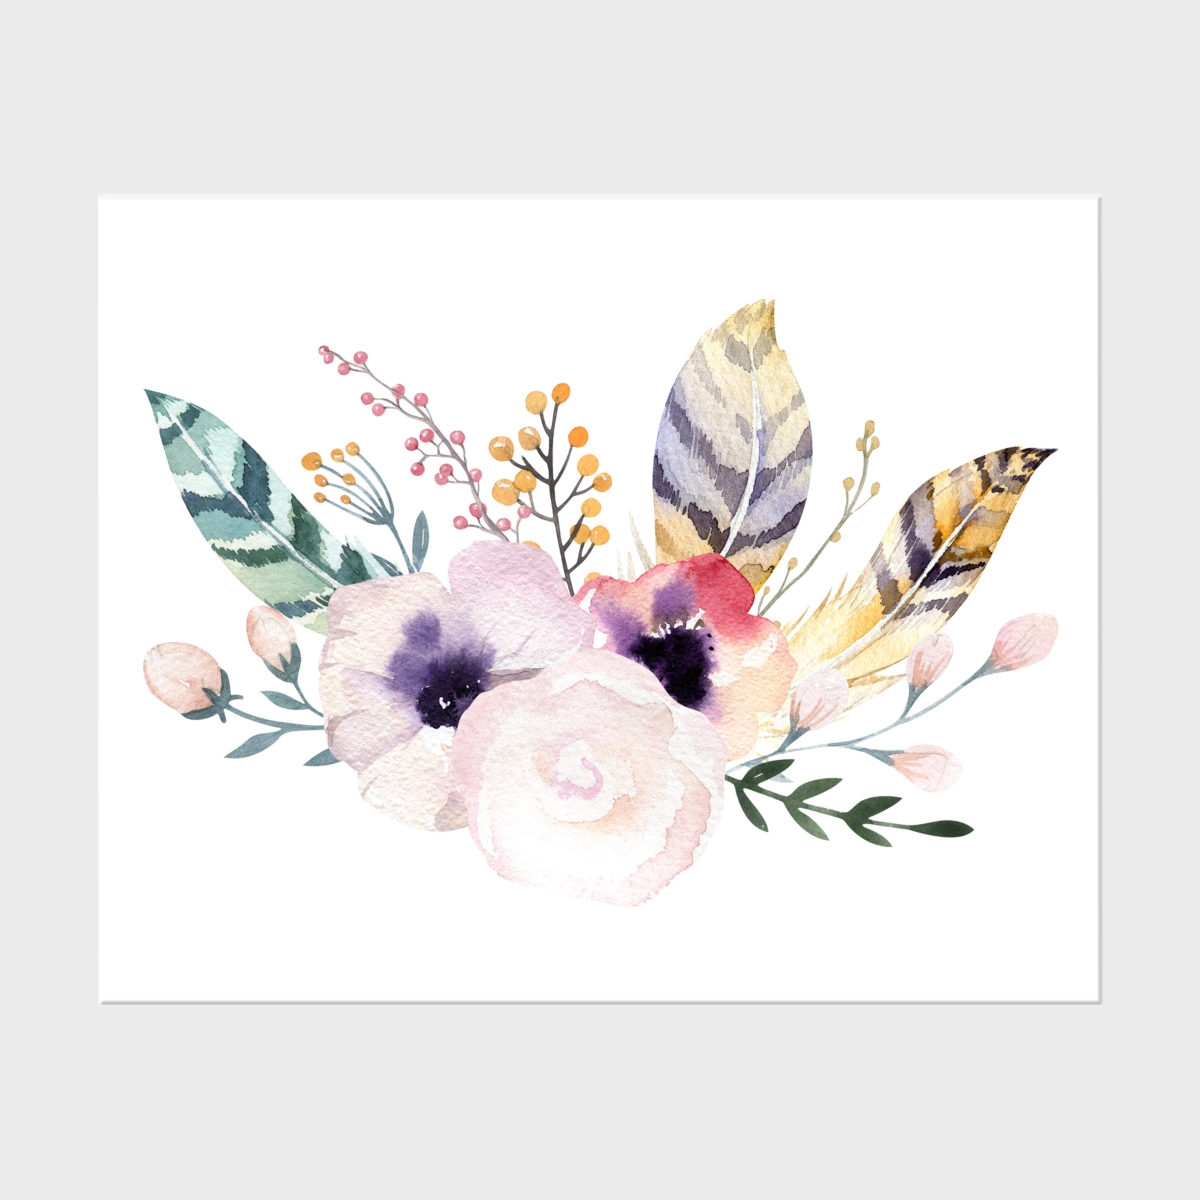 31. Floral (1)